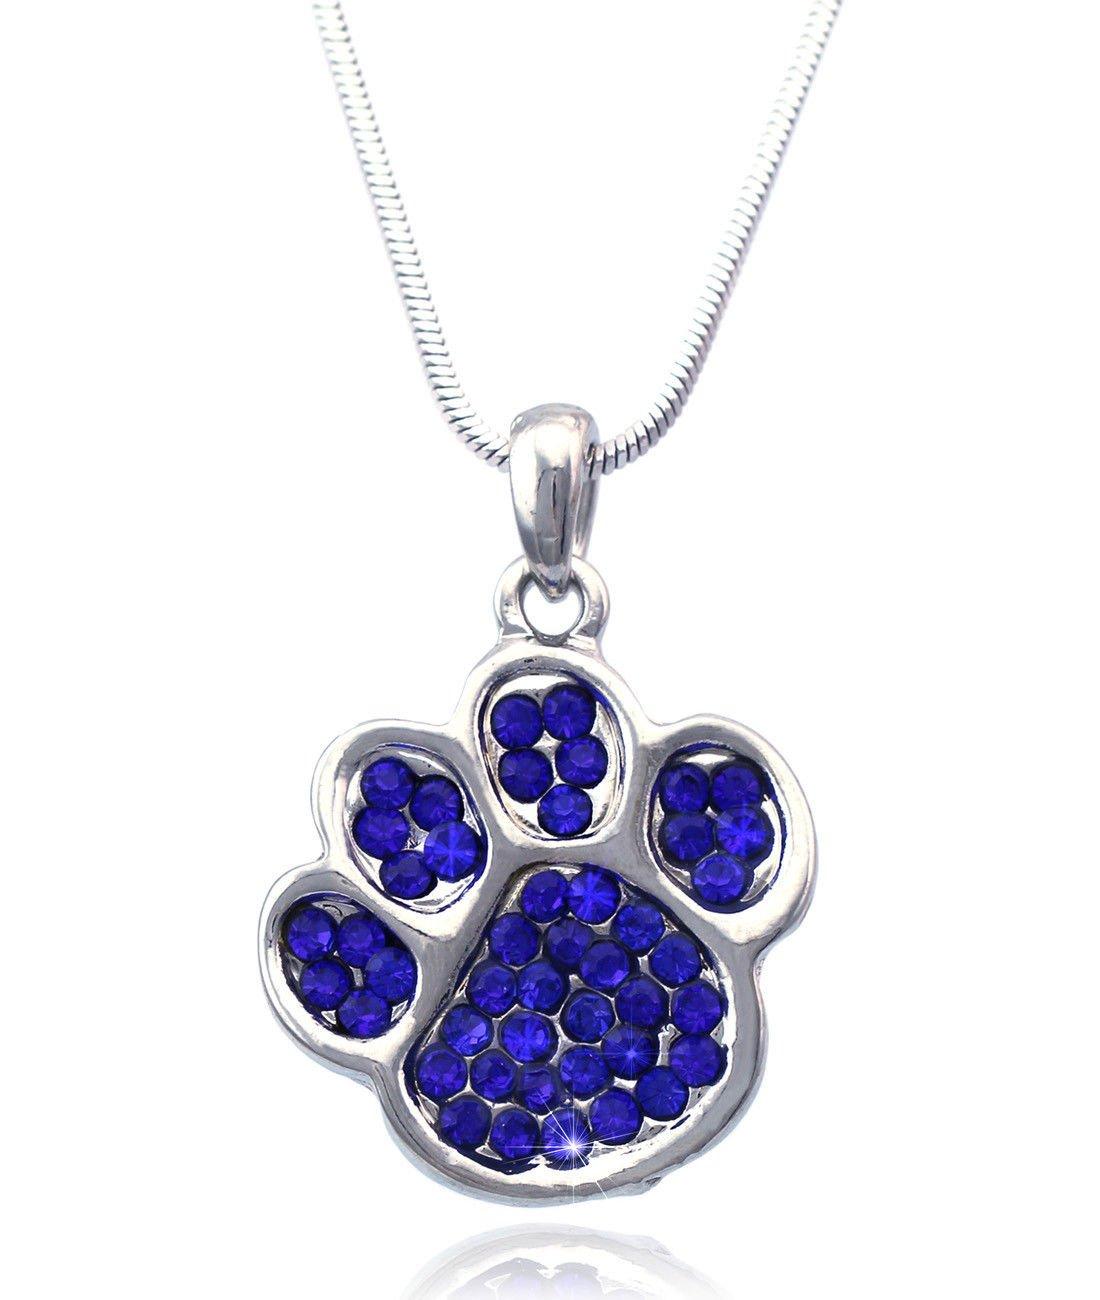 Azaina_cfj Royal Blue - Crystal Small Doggy Dog Pet Animal Paw Pendant Necklace